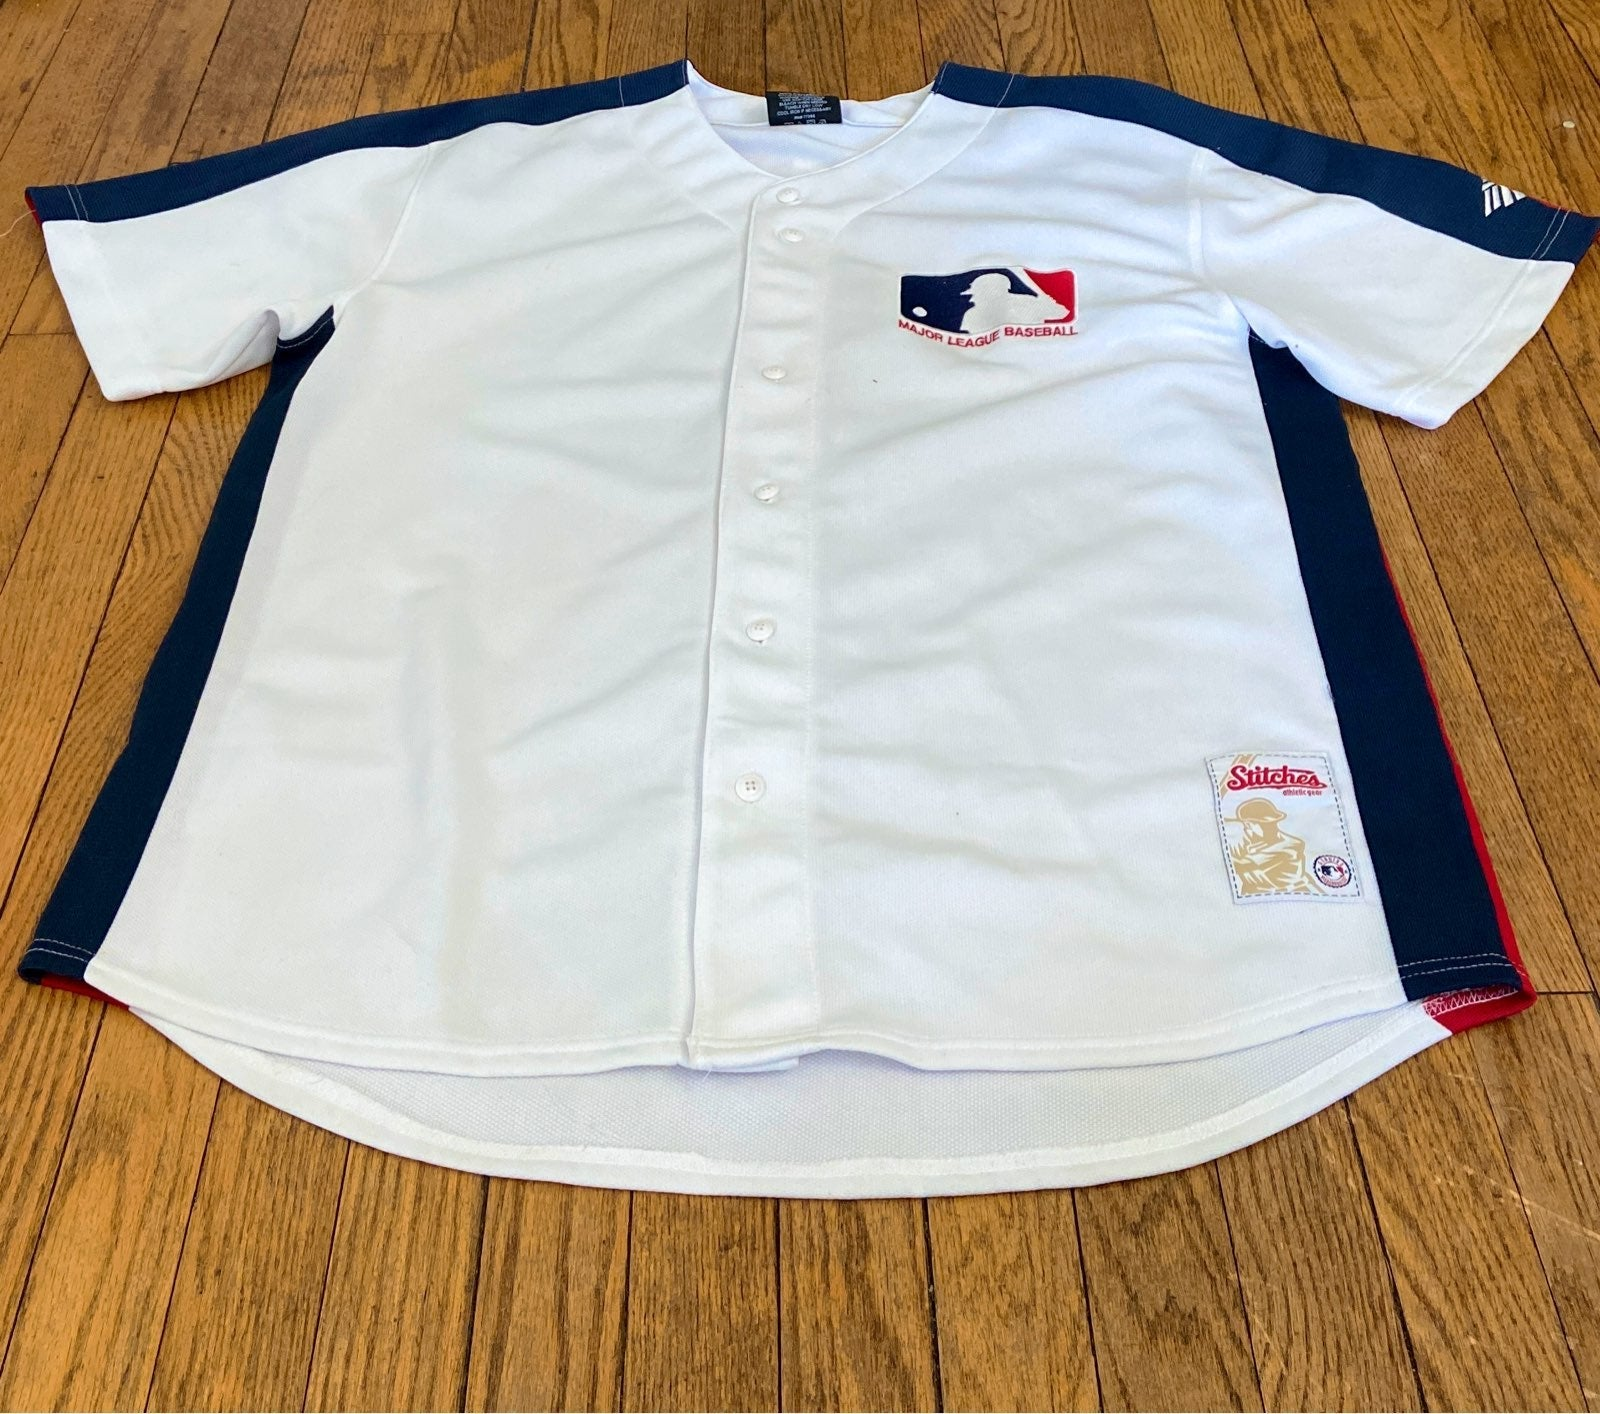 NWT MLB Stitches Genuine Merch Jersey